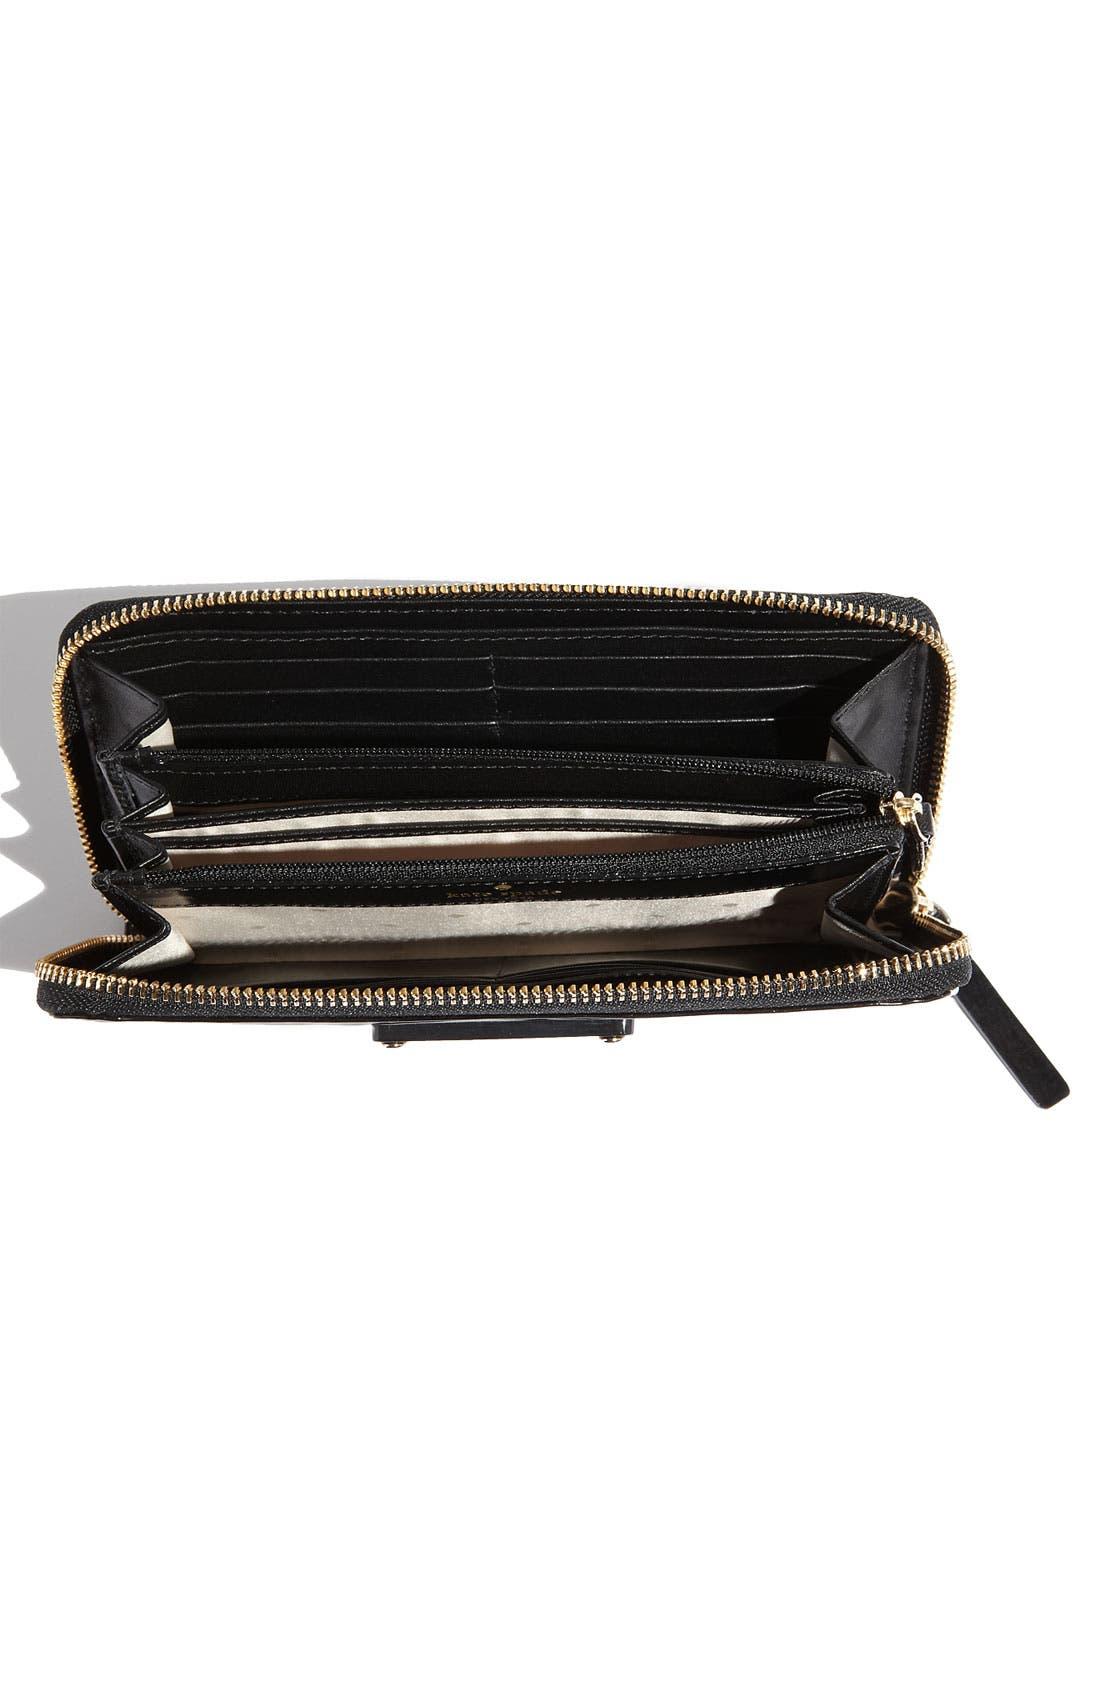 Alternate Image 3  - kate spade new york 'stripe lacey' zip around wallet